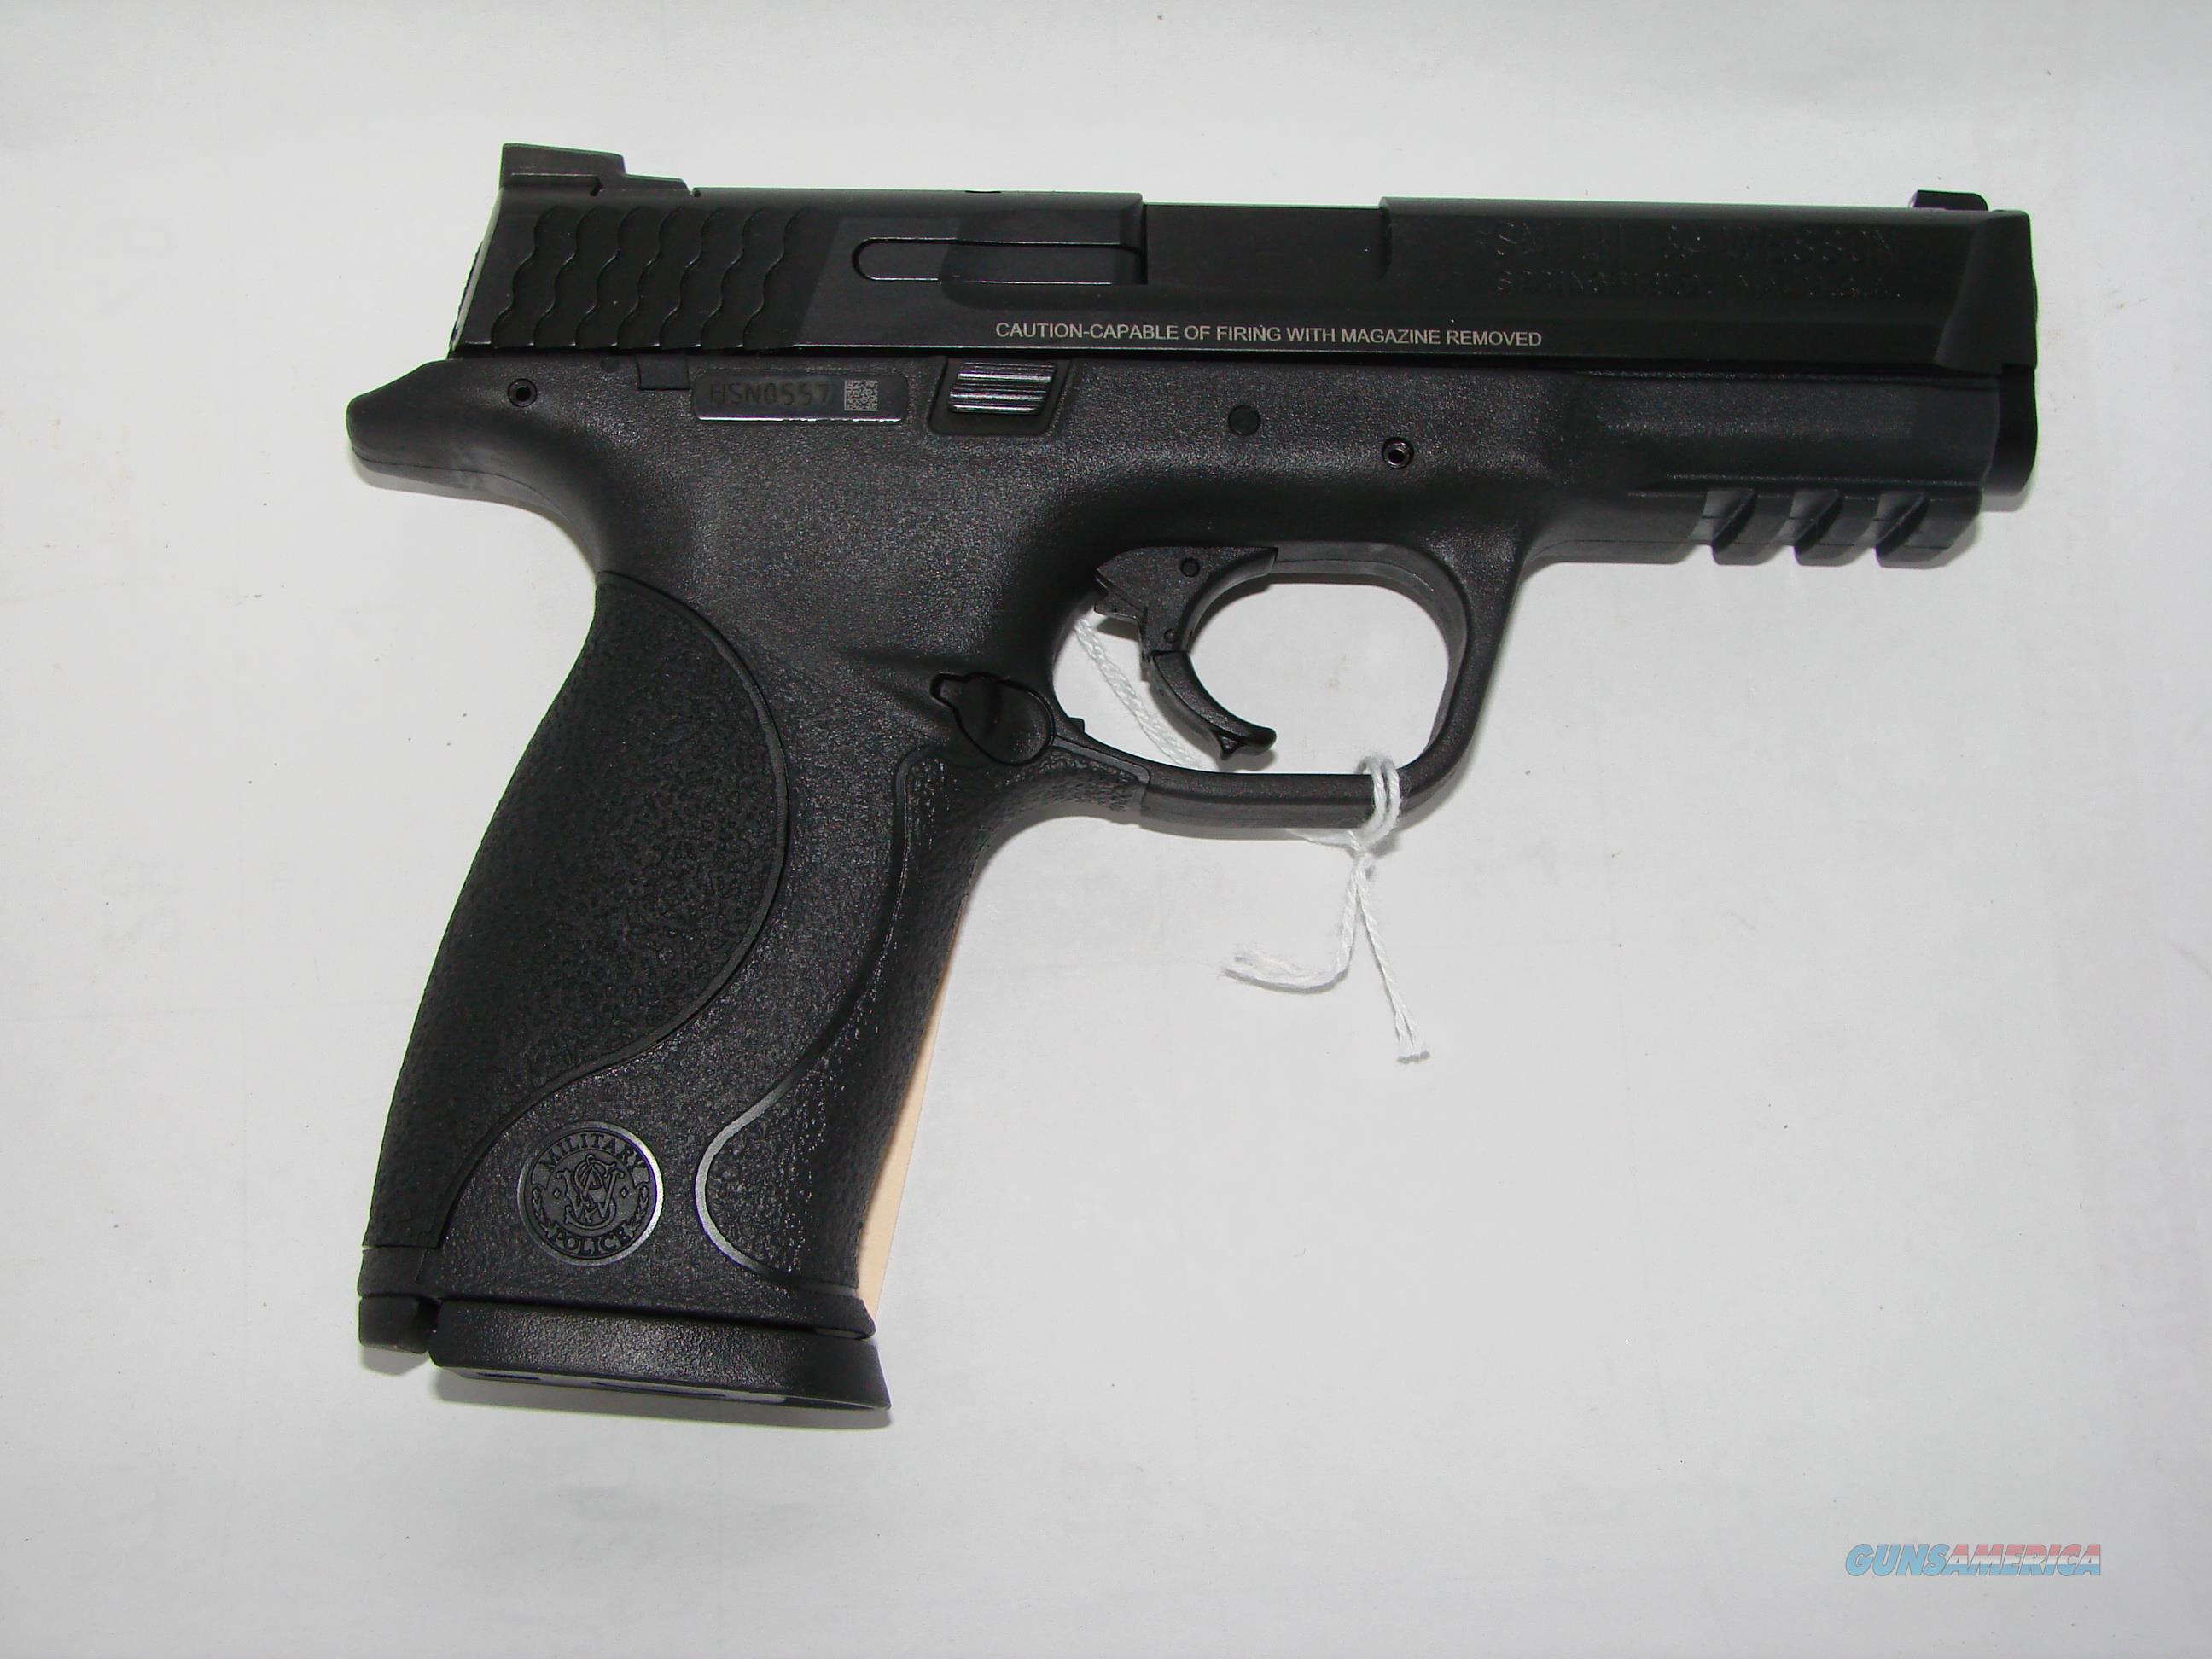 S&W MP9 Carry & Range Kit  Guns > Pistols > Smith & Wesson Pistols - Autos > Polymer Frame